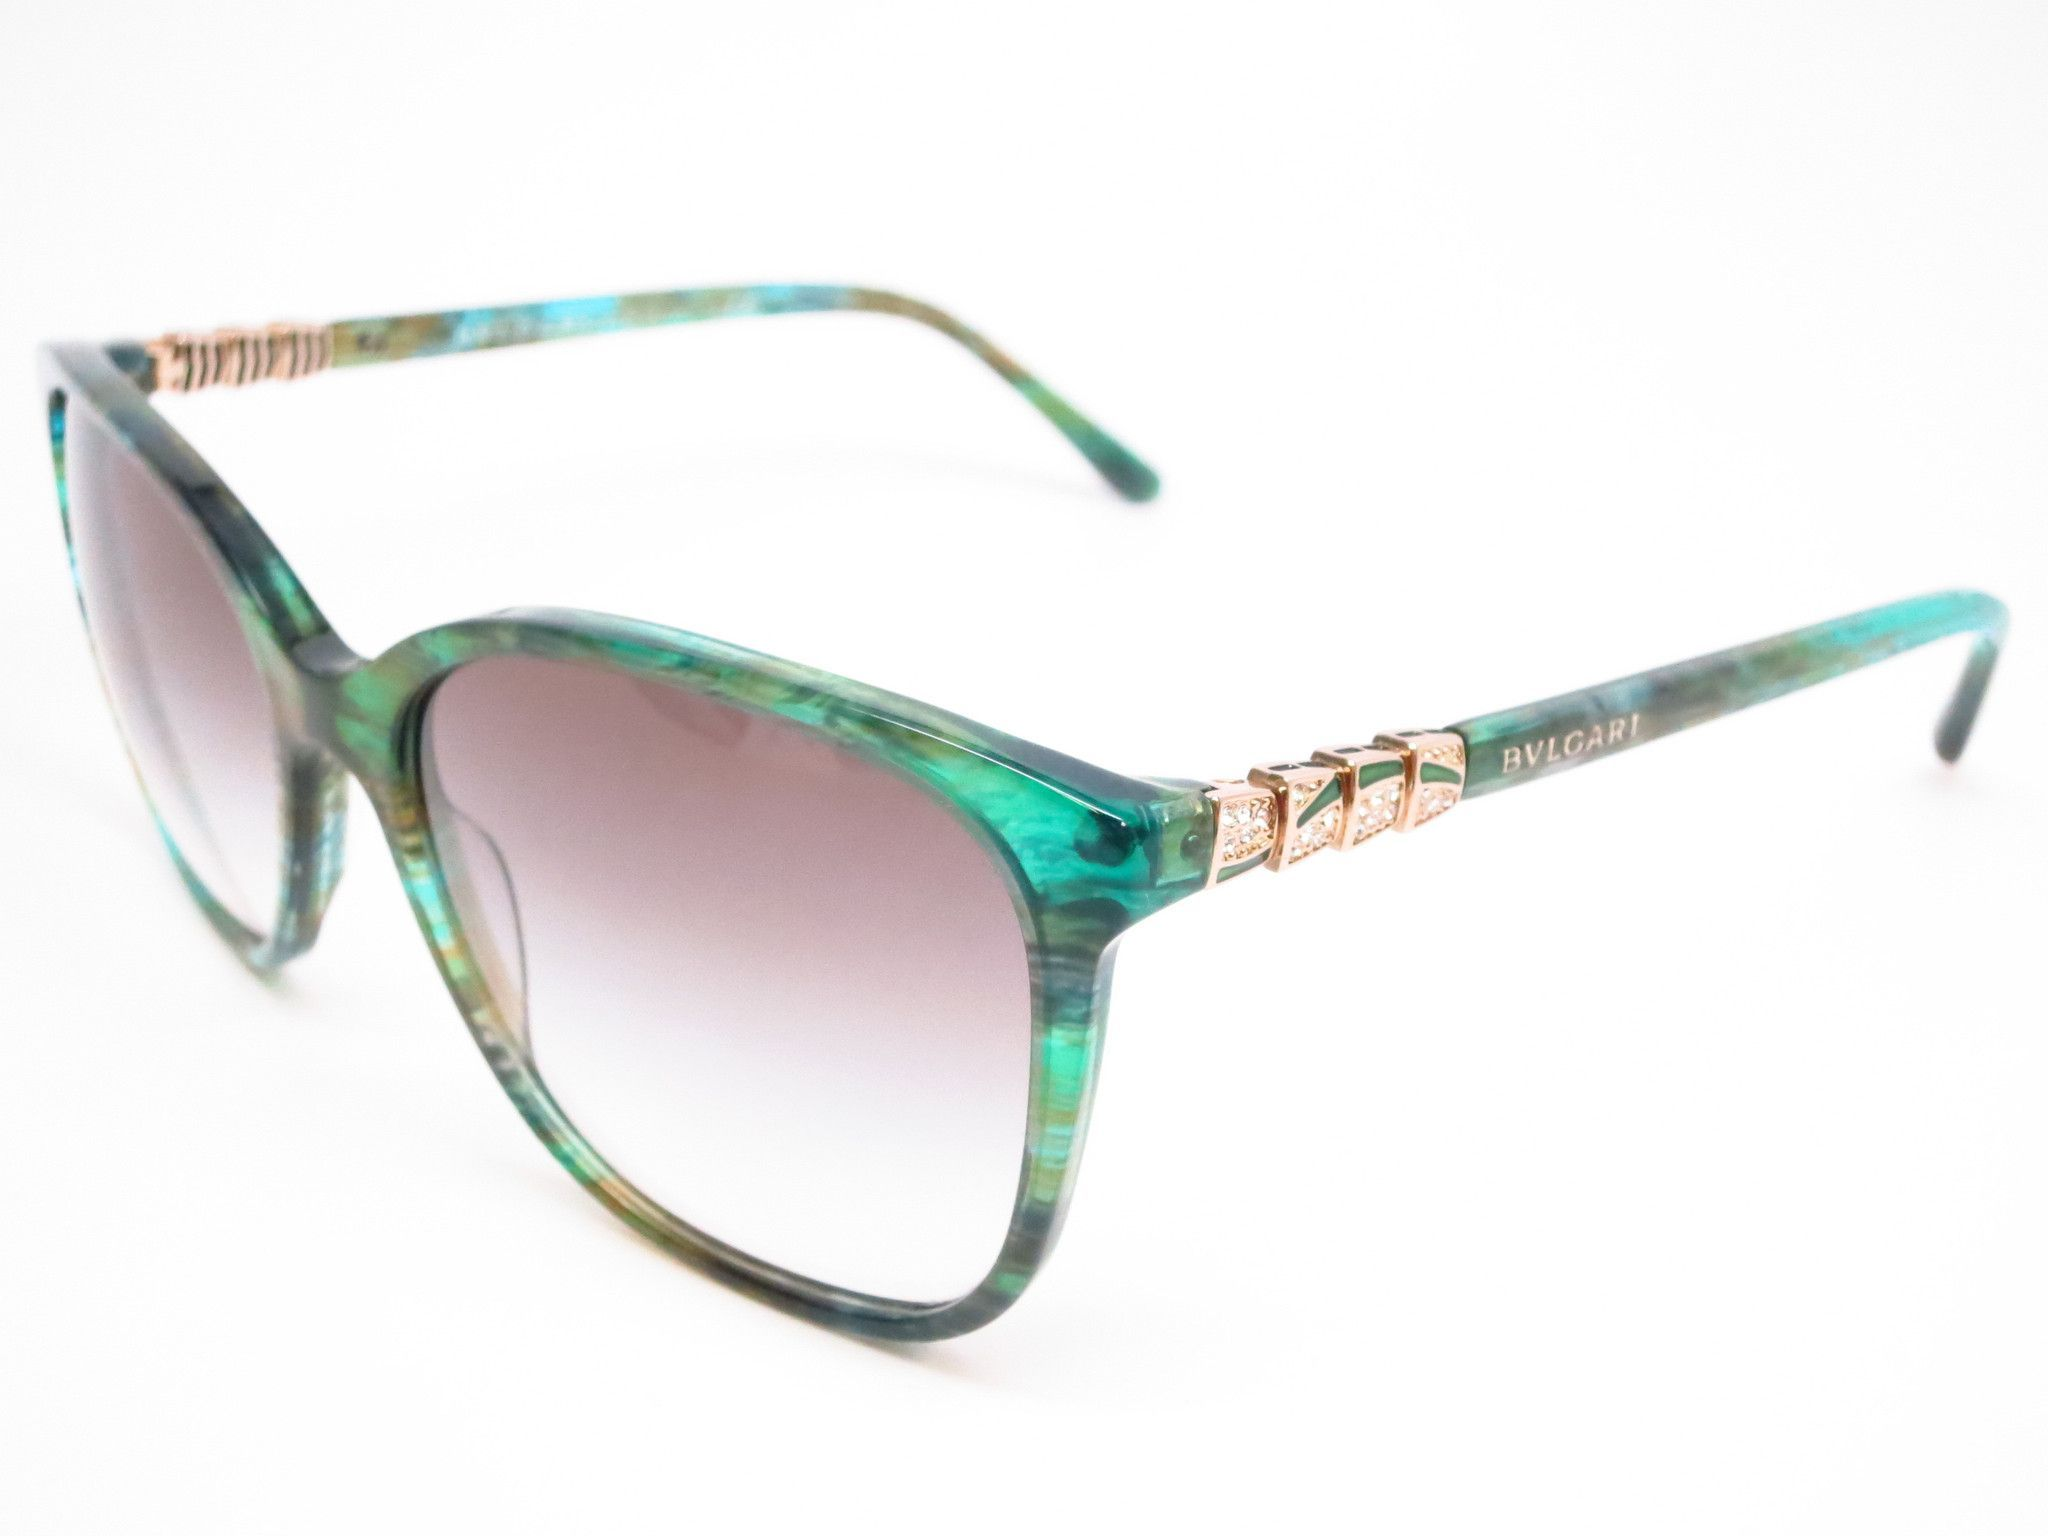 4071fd17d2 Bvlgari BV 8152B 5340 8E Green Aqua Fantasy Sunglasses